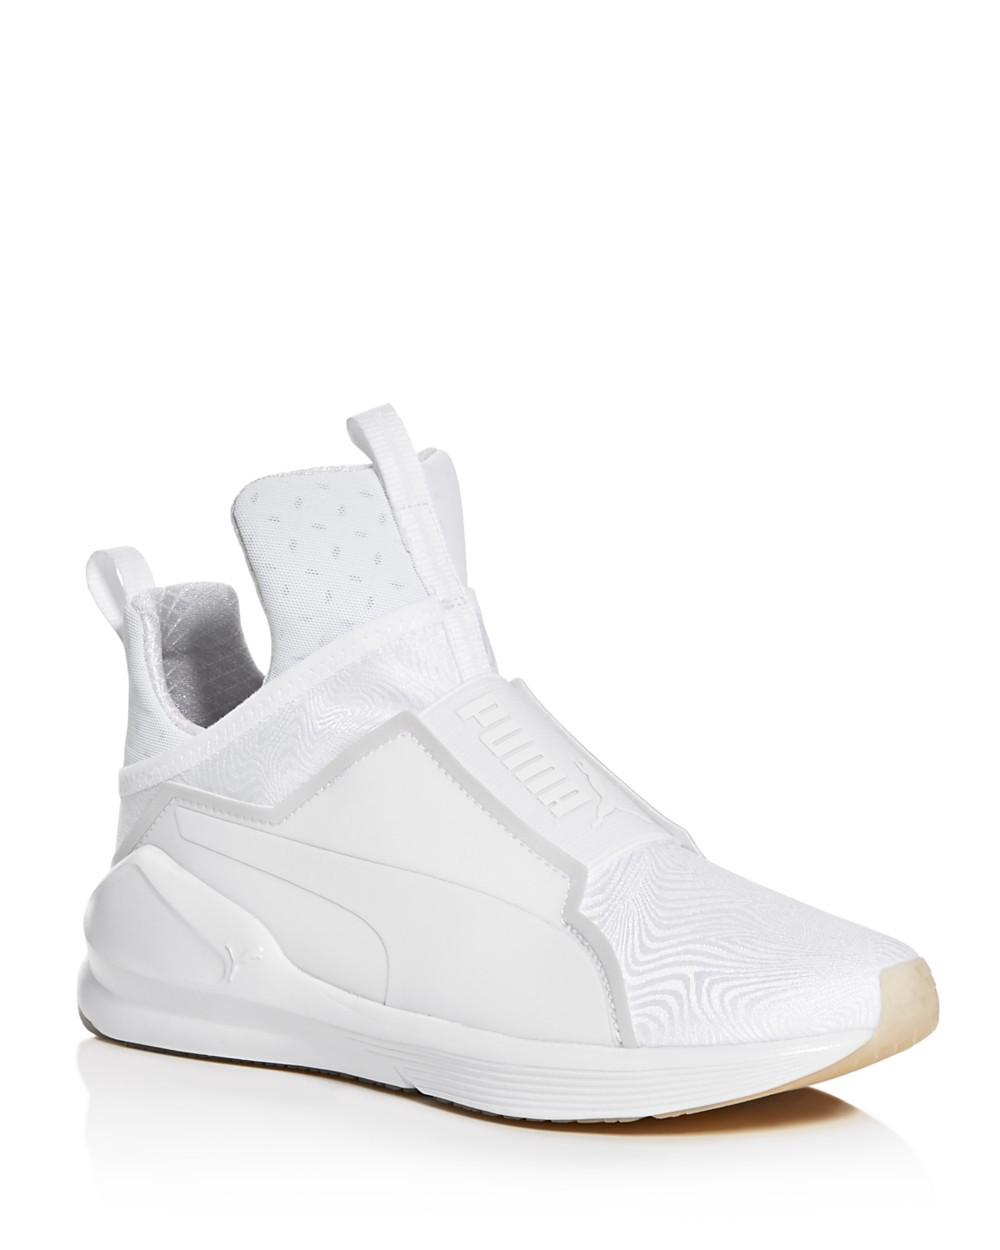 Puma Sneakers PUMA Fierce Bright Sneakers